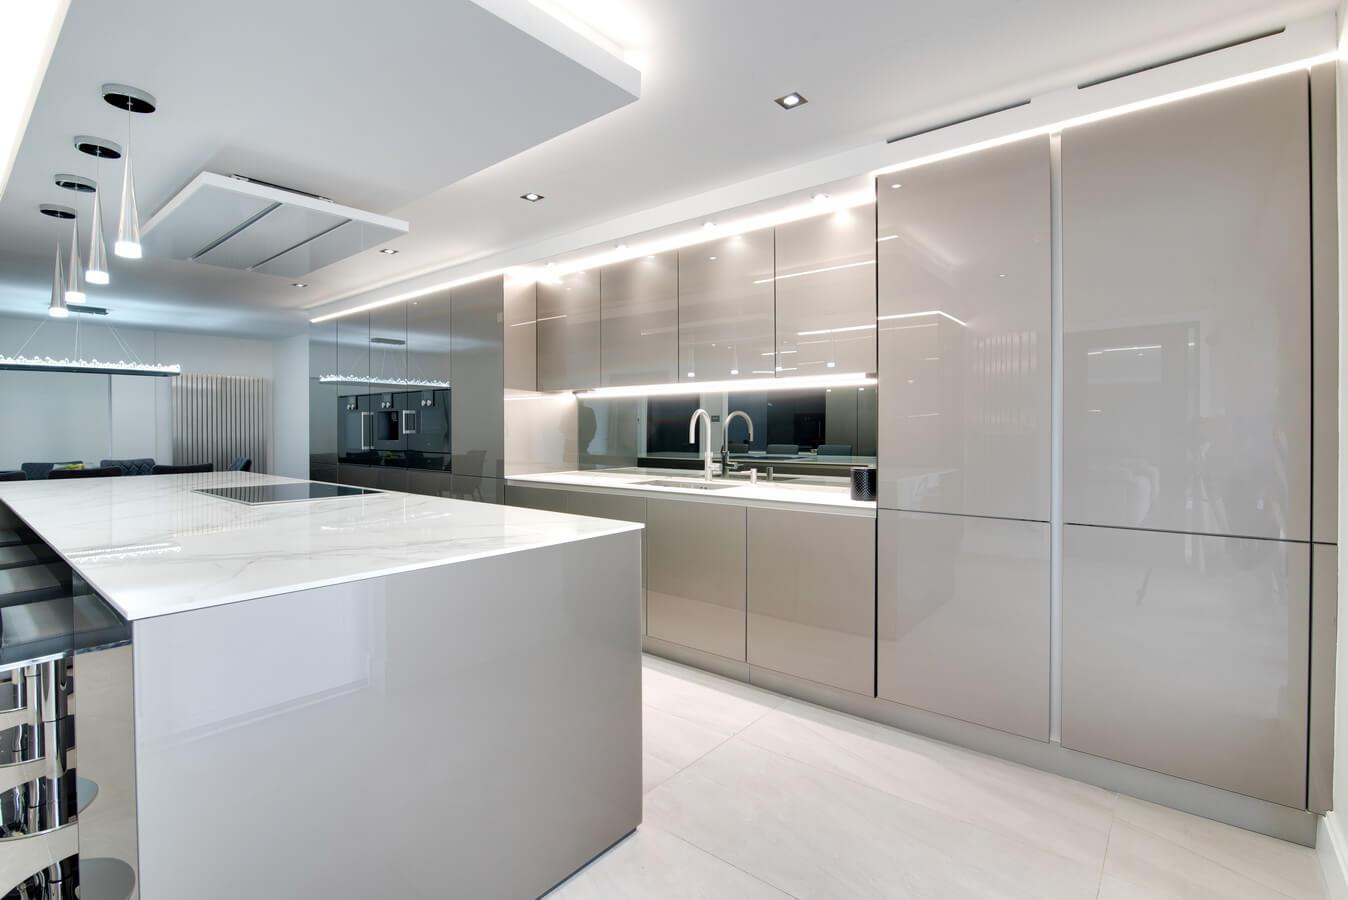 Glossy-glass-doored-German-kitchen.jpg